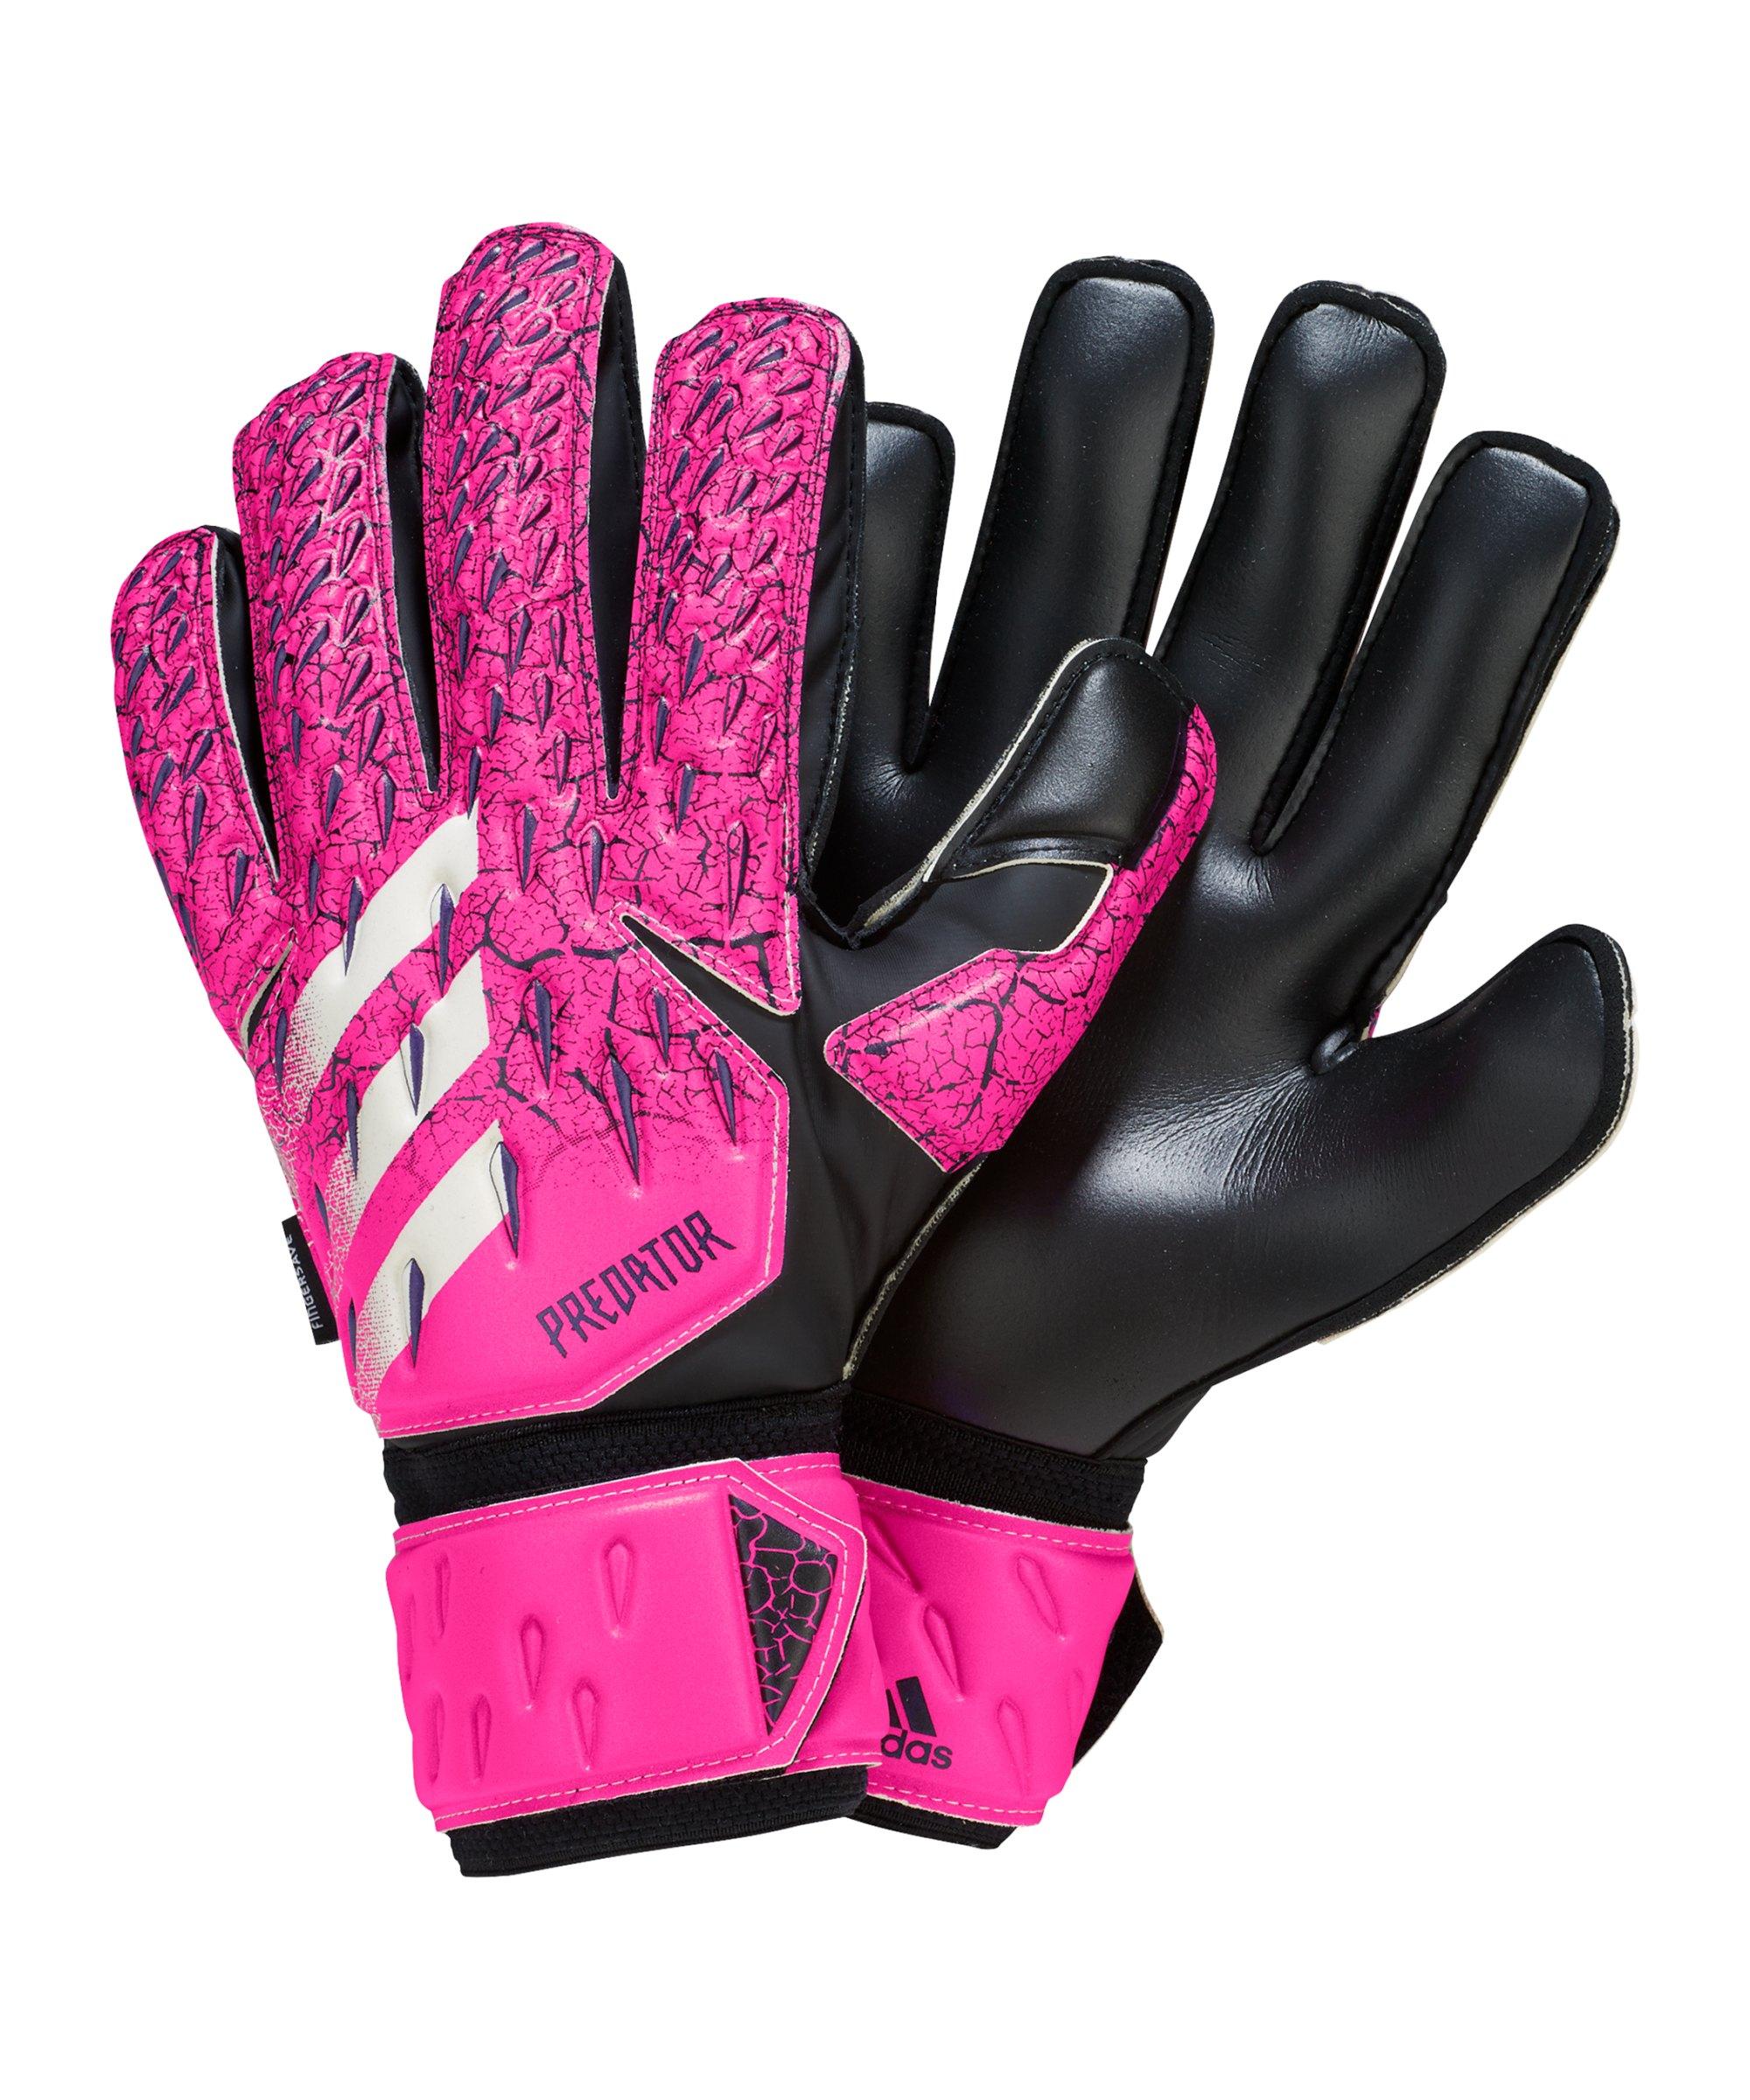 adidas Predator MTC Torwarthandschuh Pink Lila - pink